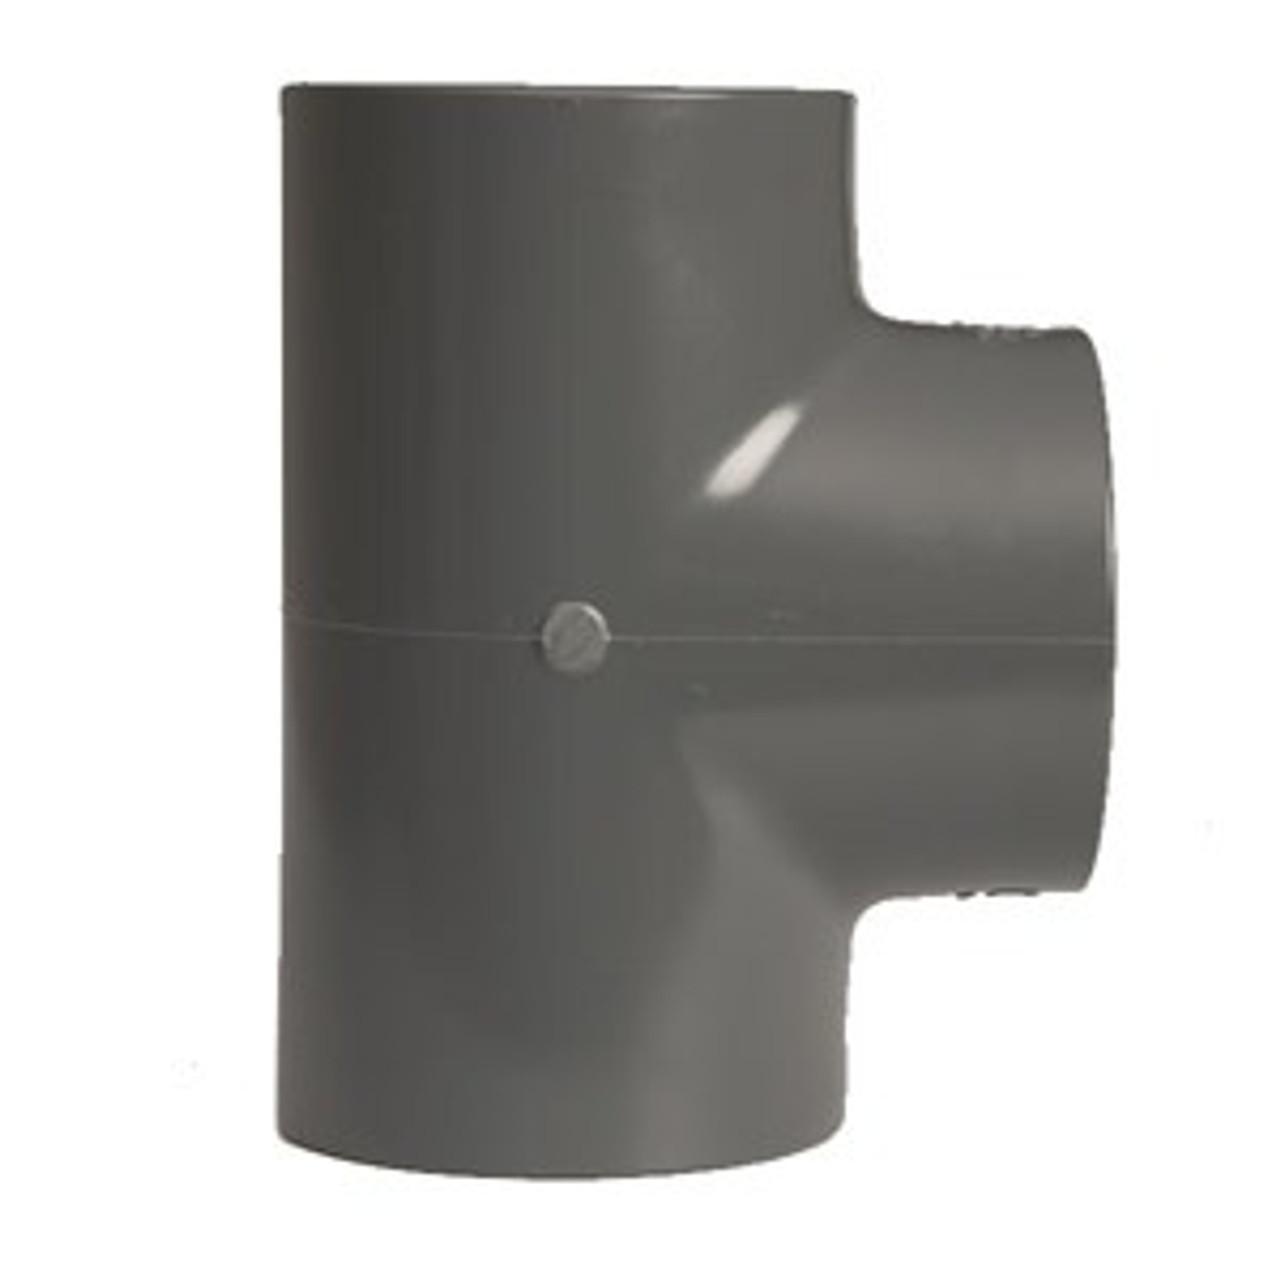 +GF+ | Tee 90 Equal PVC-U  75mm (721200112)